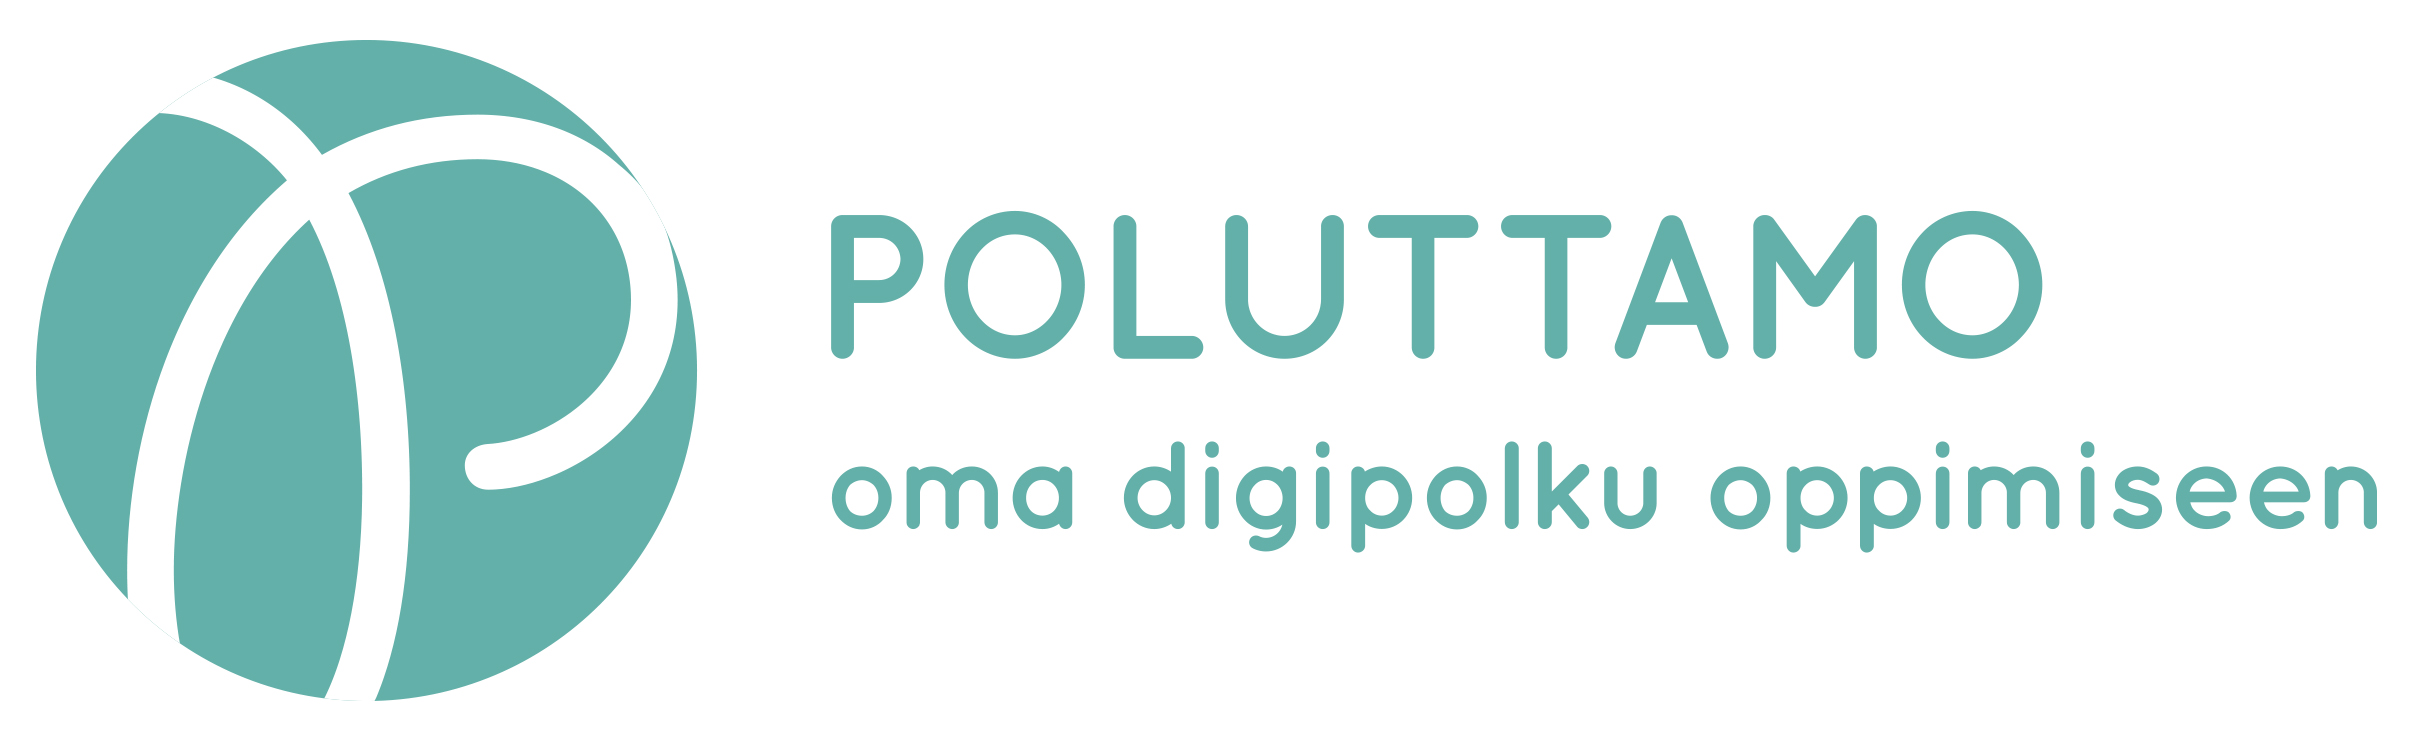 Logo: Poluttamo - oma digipolku oppimiseen